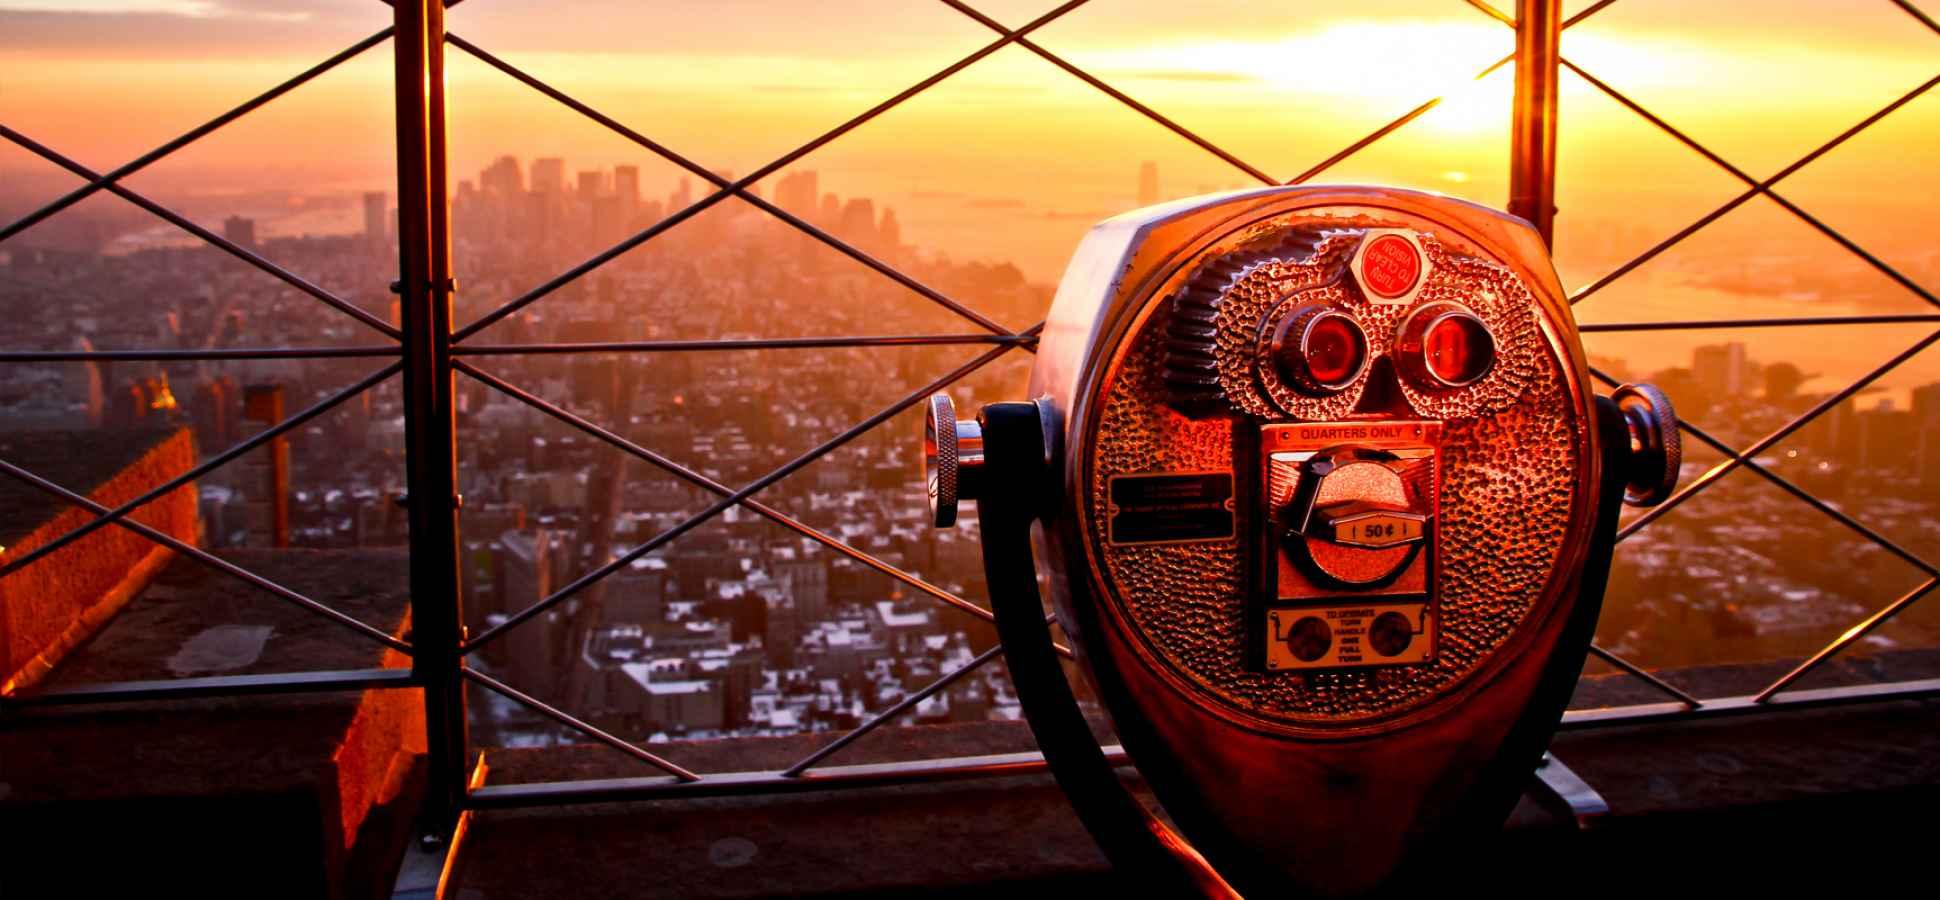 4 Ways Visual Content Romances Your Audience